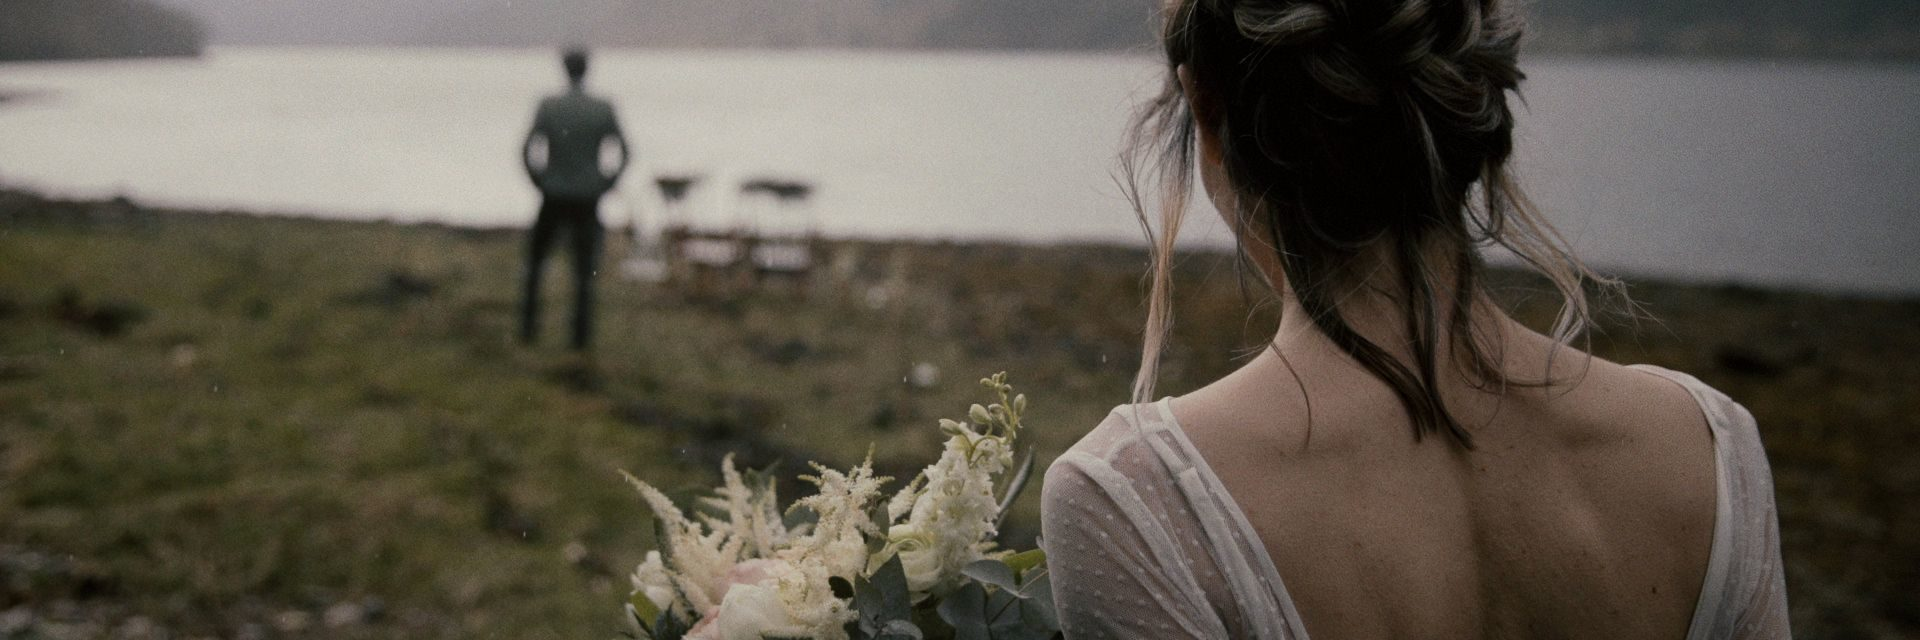 florance-wedding-videographer-cinemate-films-02